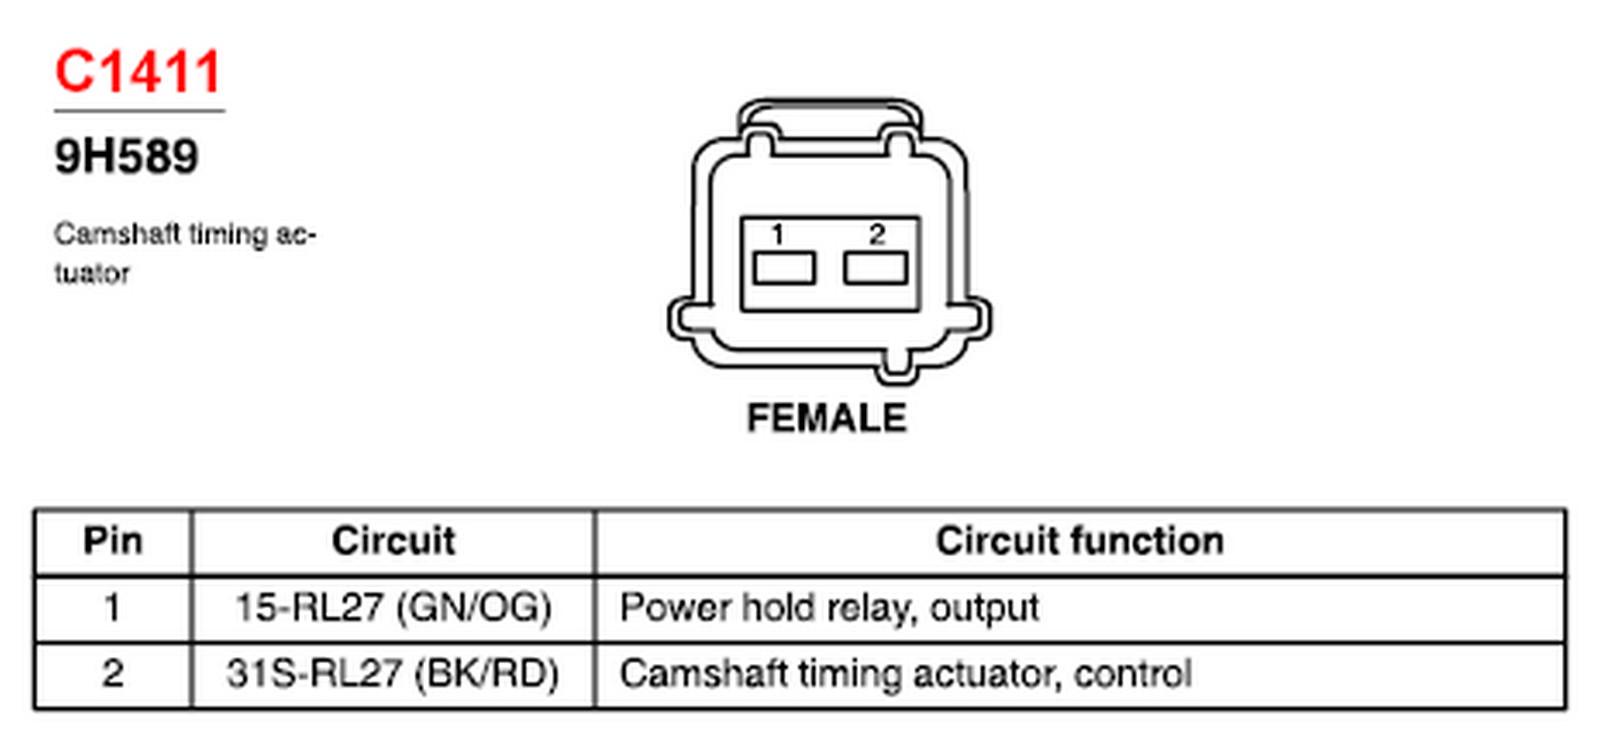 Variable Valve Timing Actuator Wiring Diagram